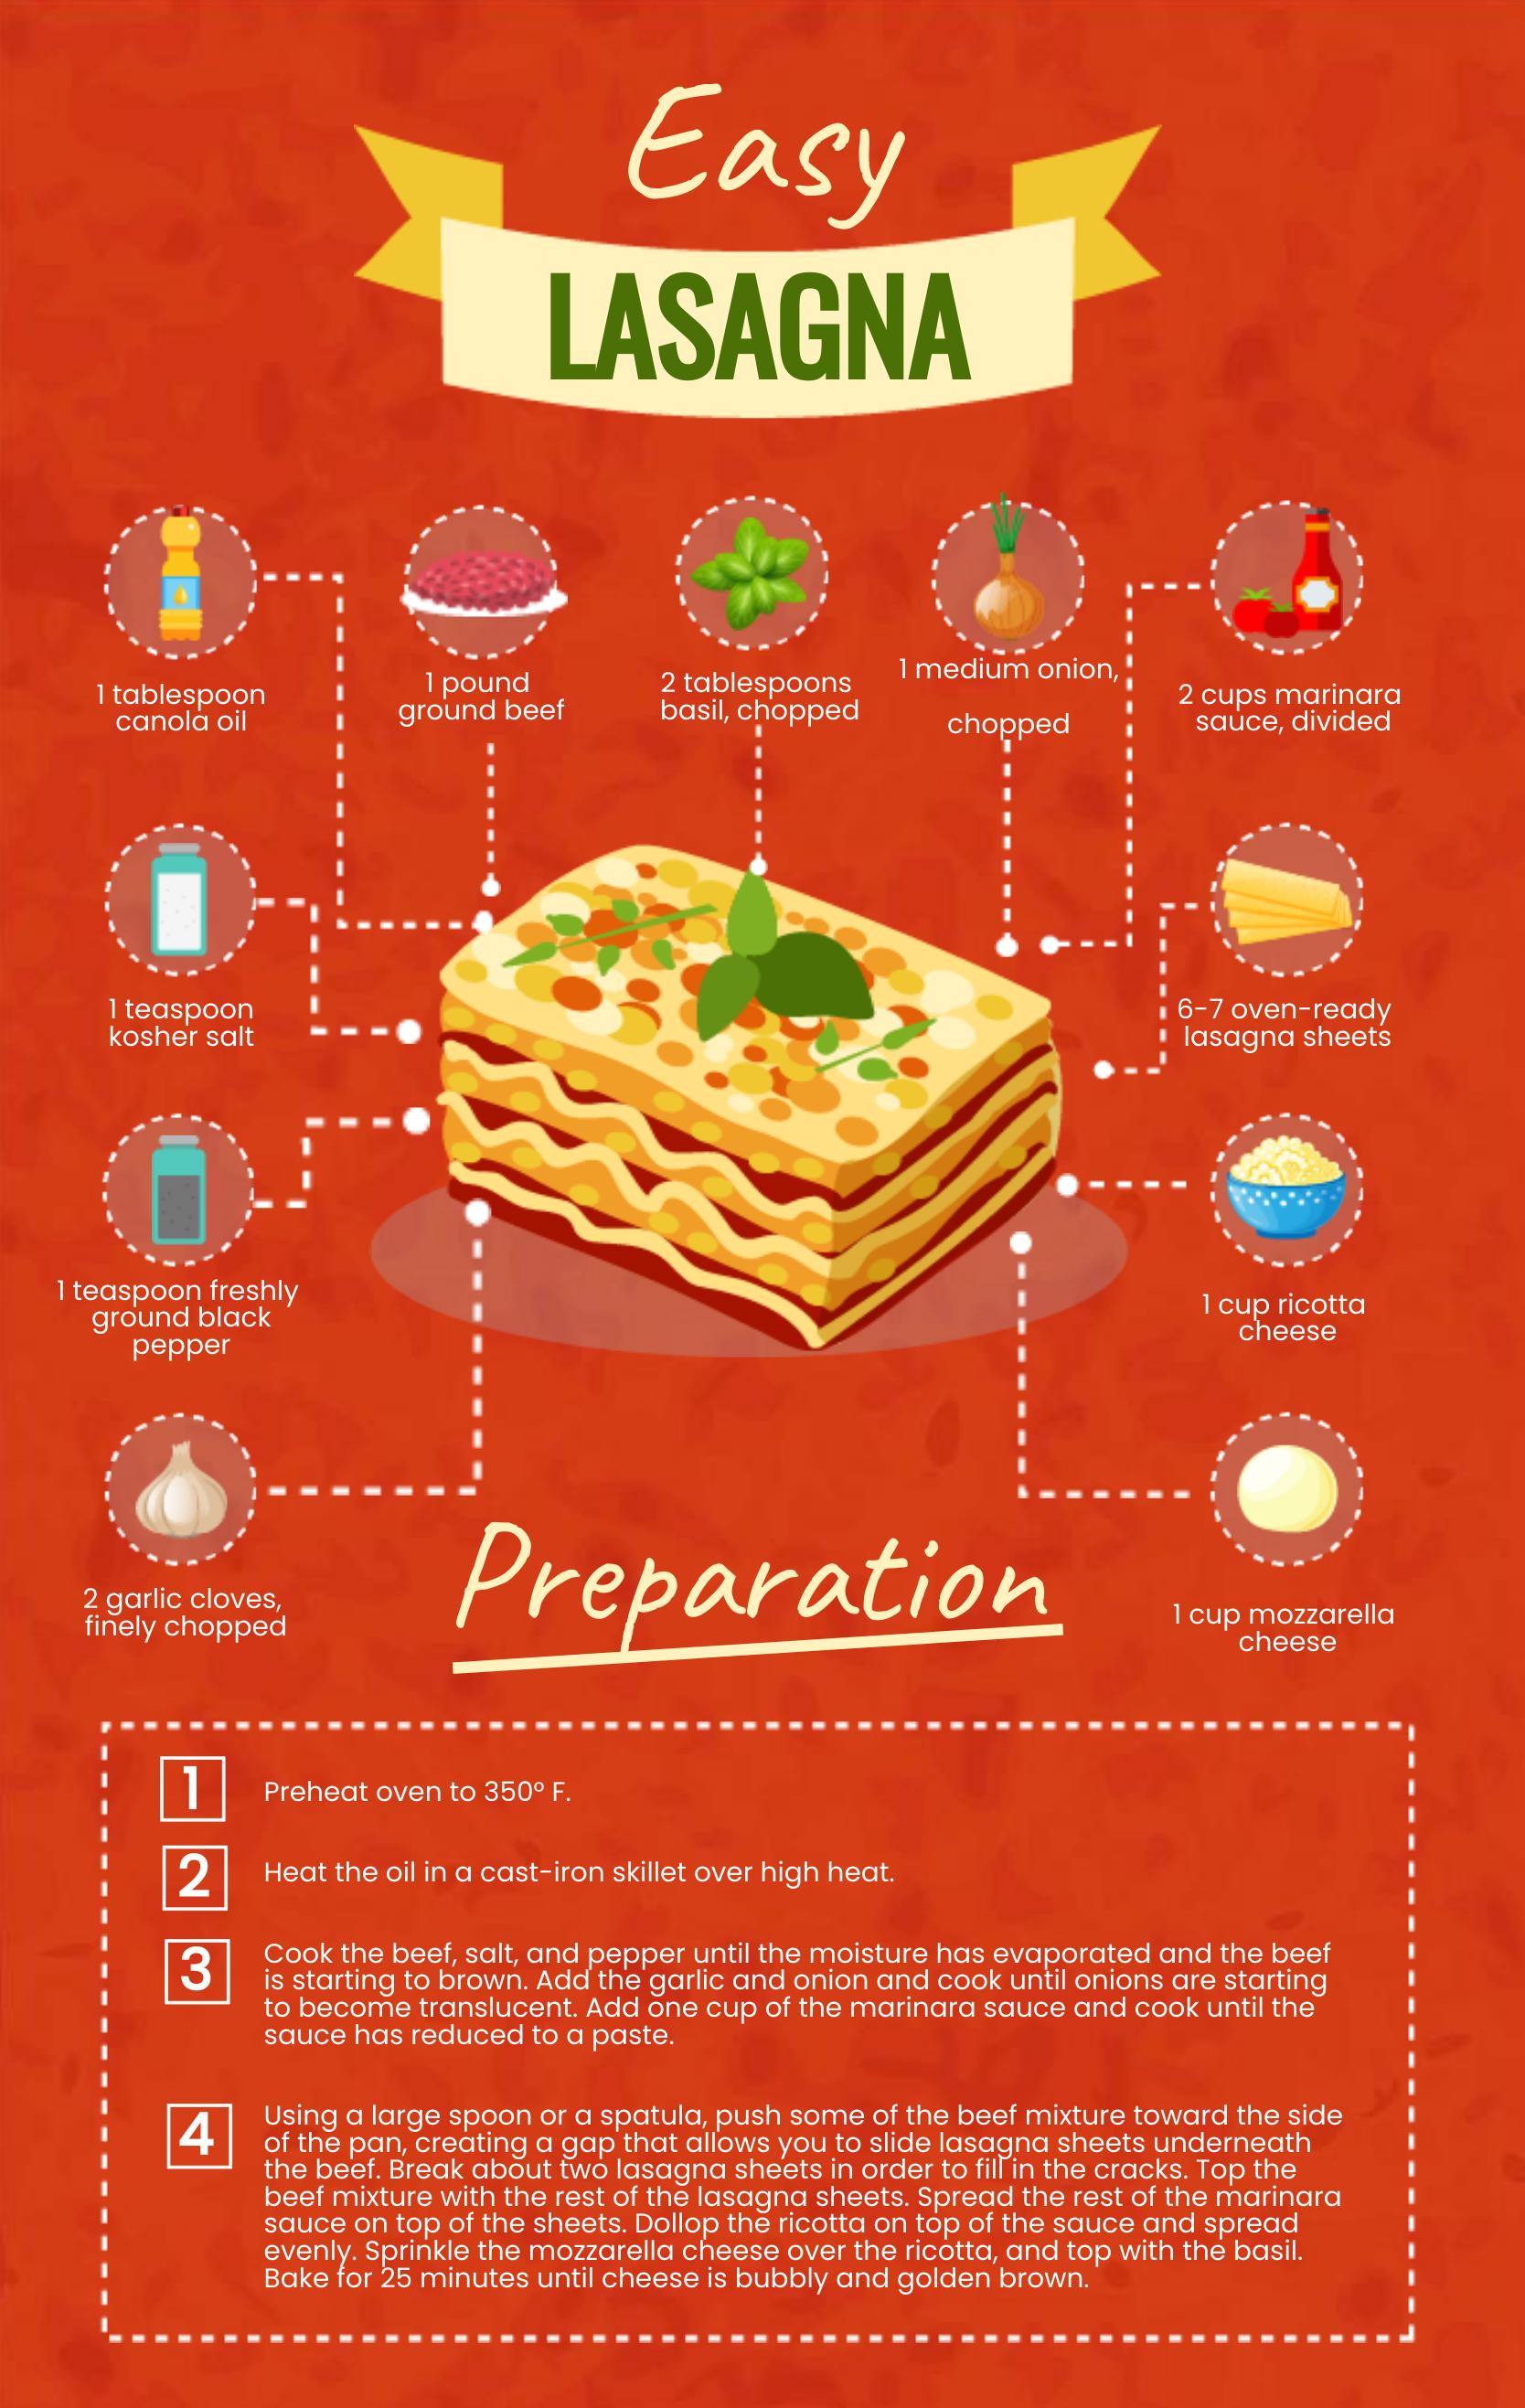 Easy lasagna infographic